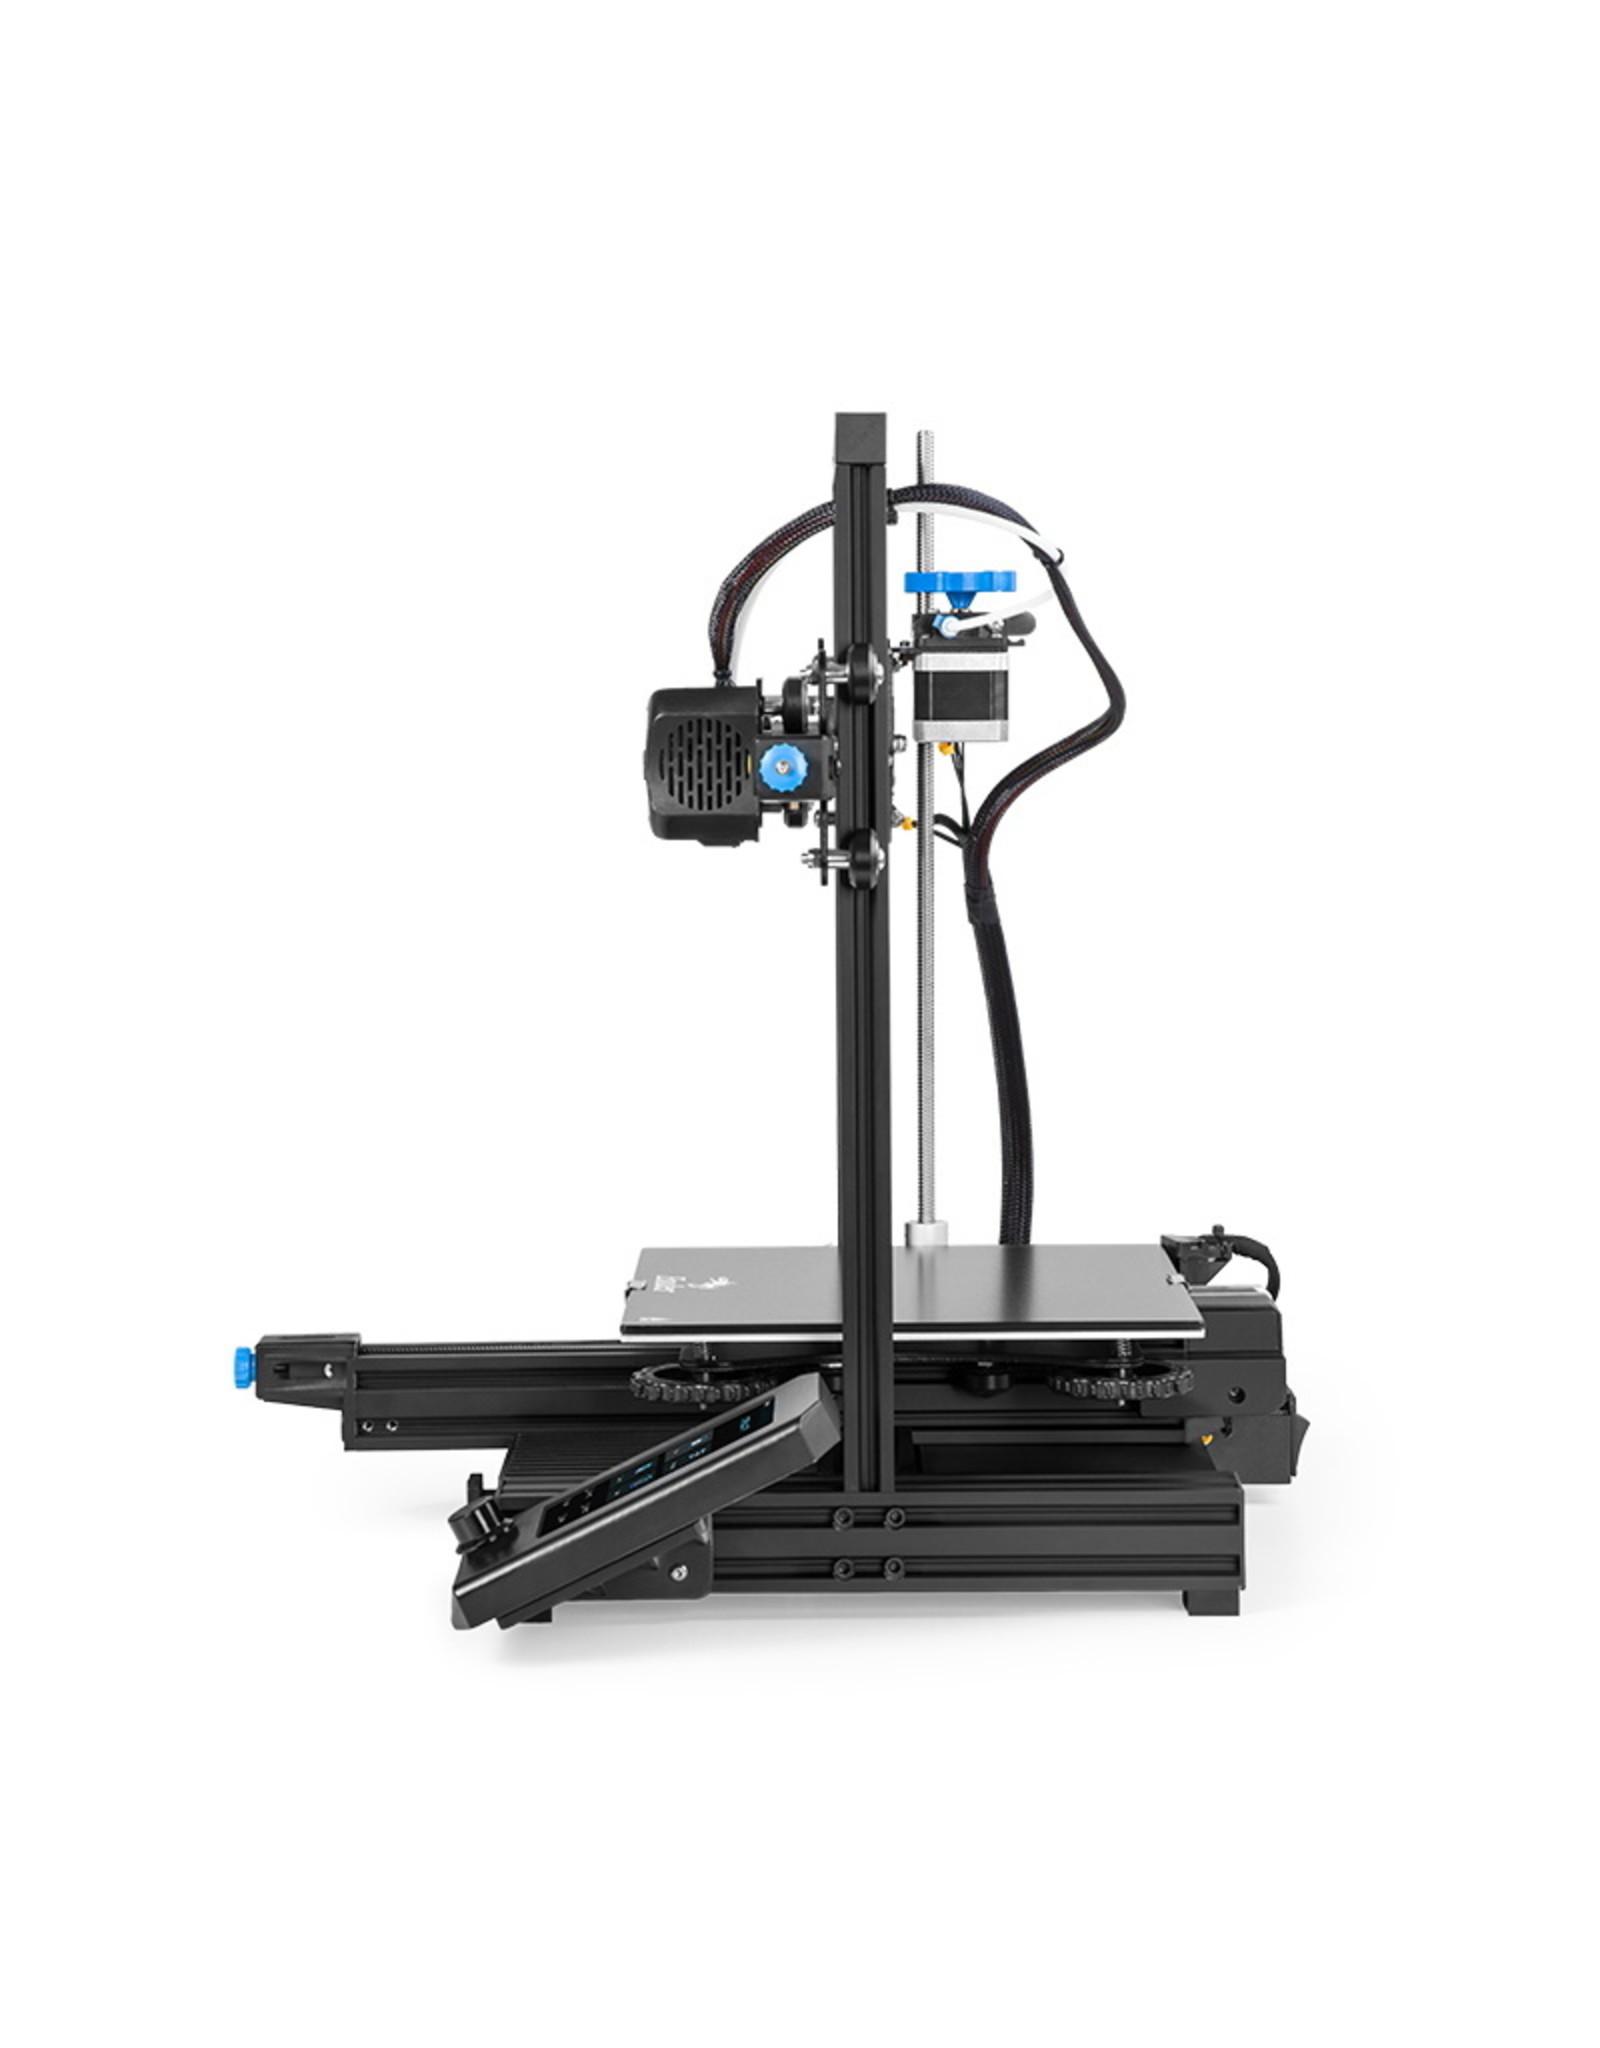 Creality/Ender Creality Ender-3 V2 3D-printer - 220x220x250 mm